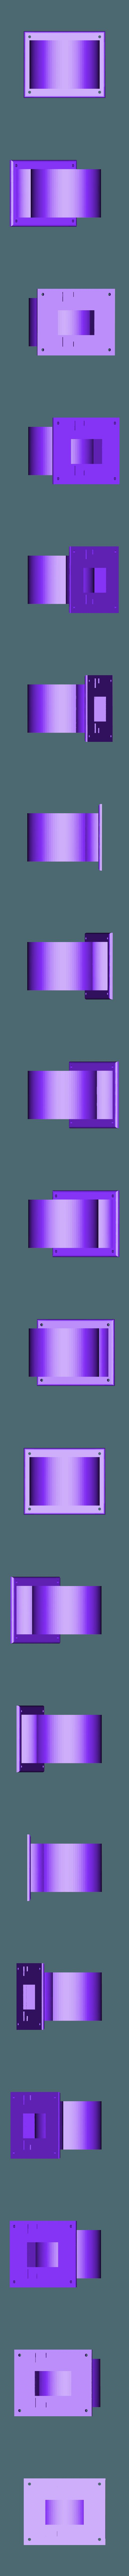 top-level.stl Download free STL file Steampunk Oculus Roboticus • 3D print design, cyrusharding